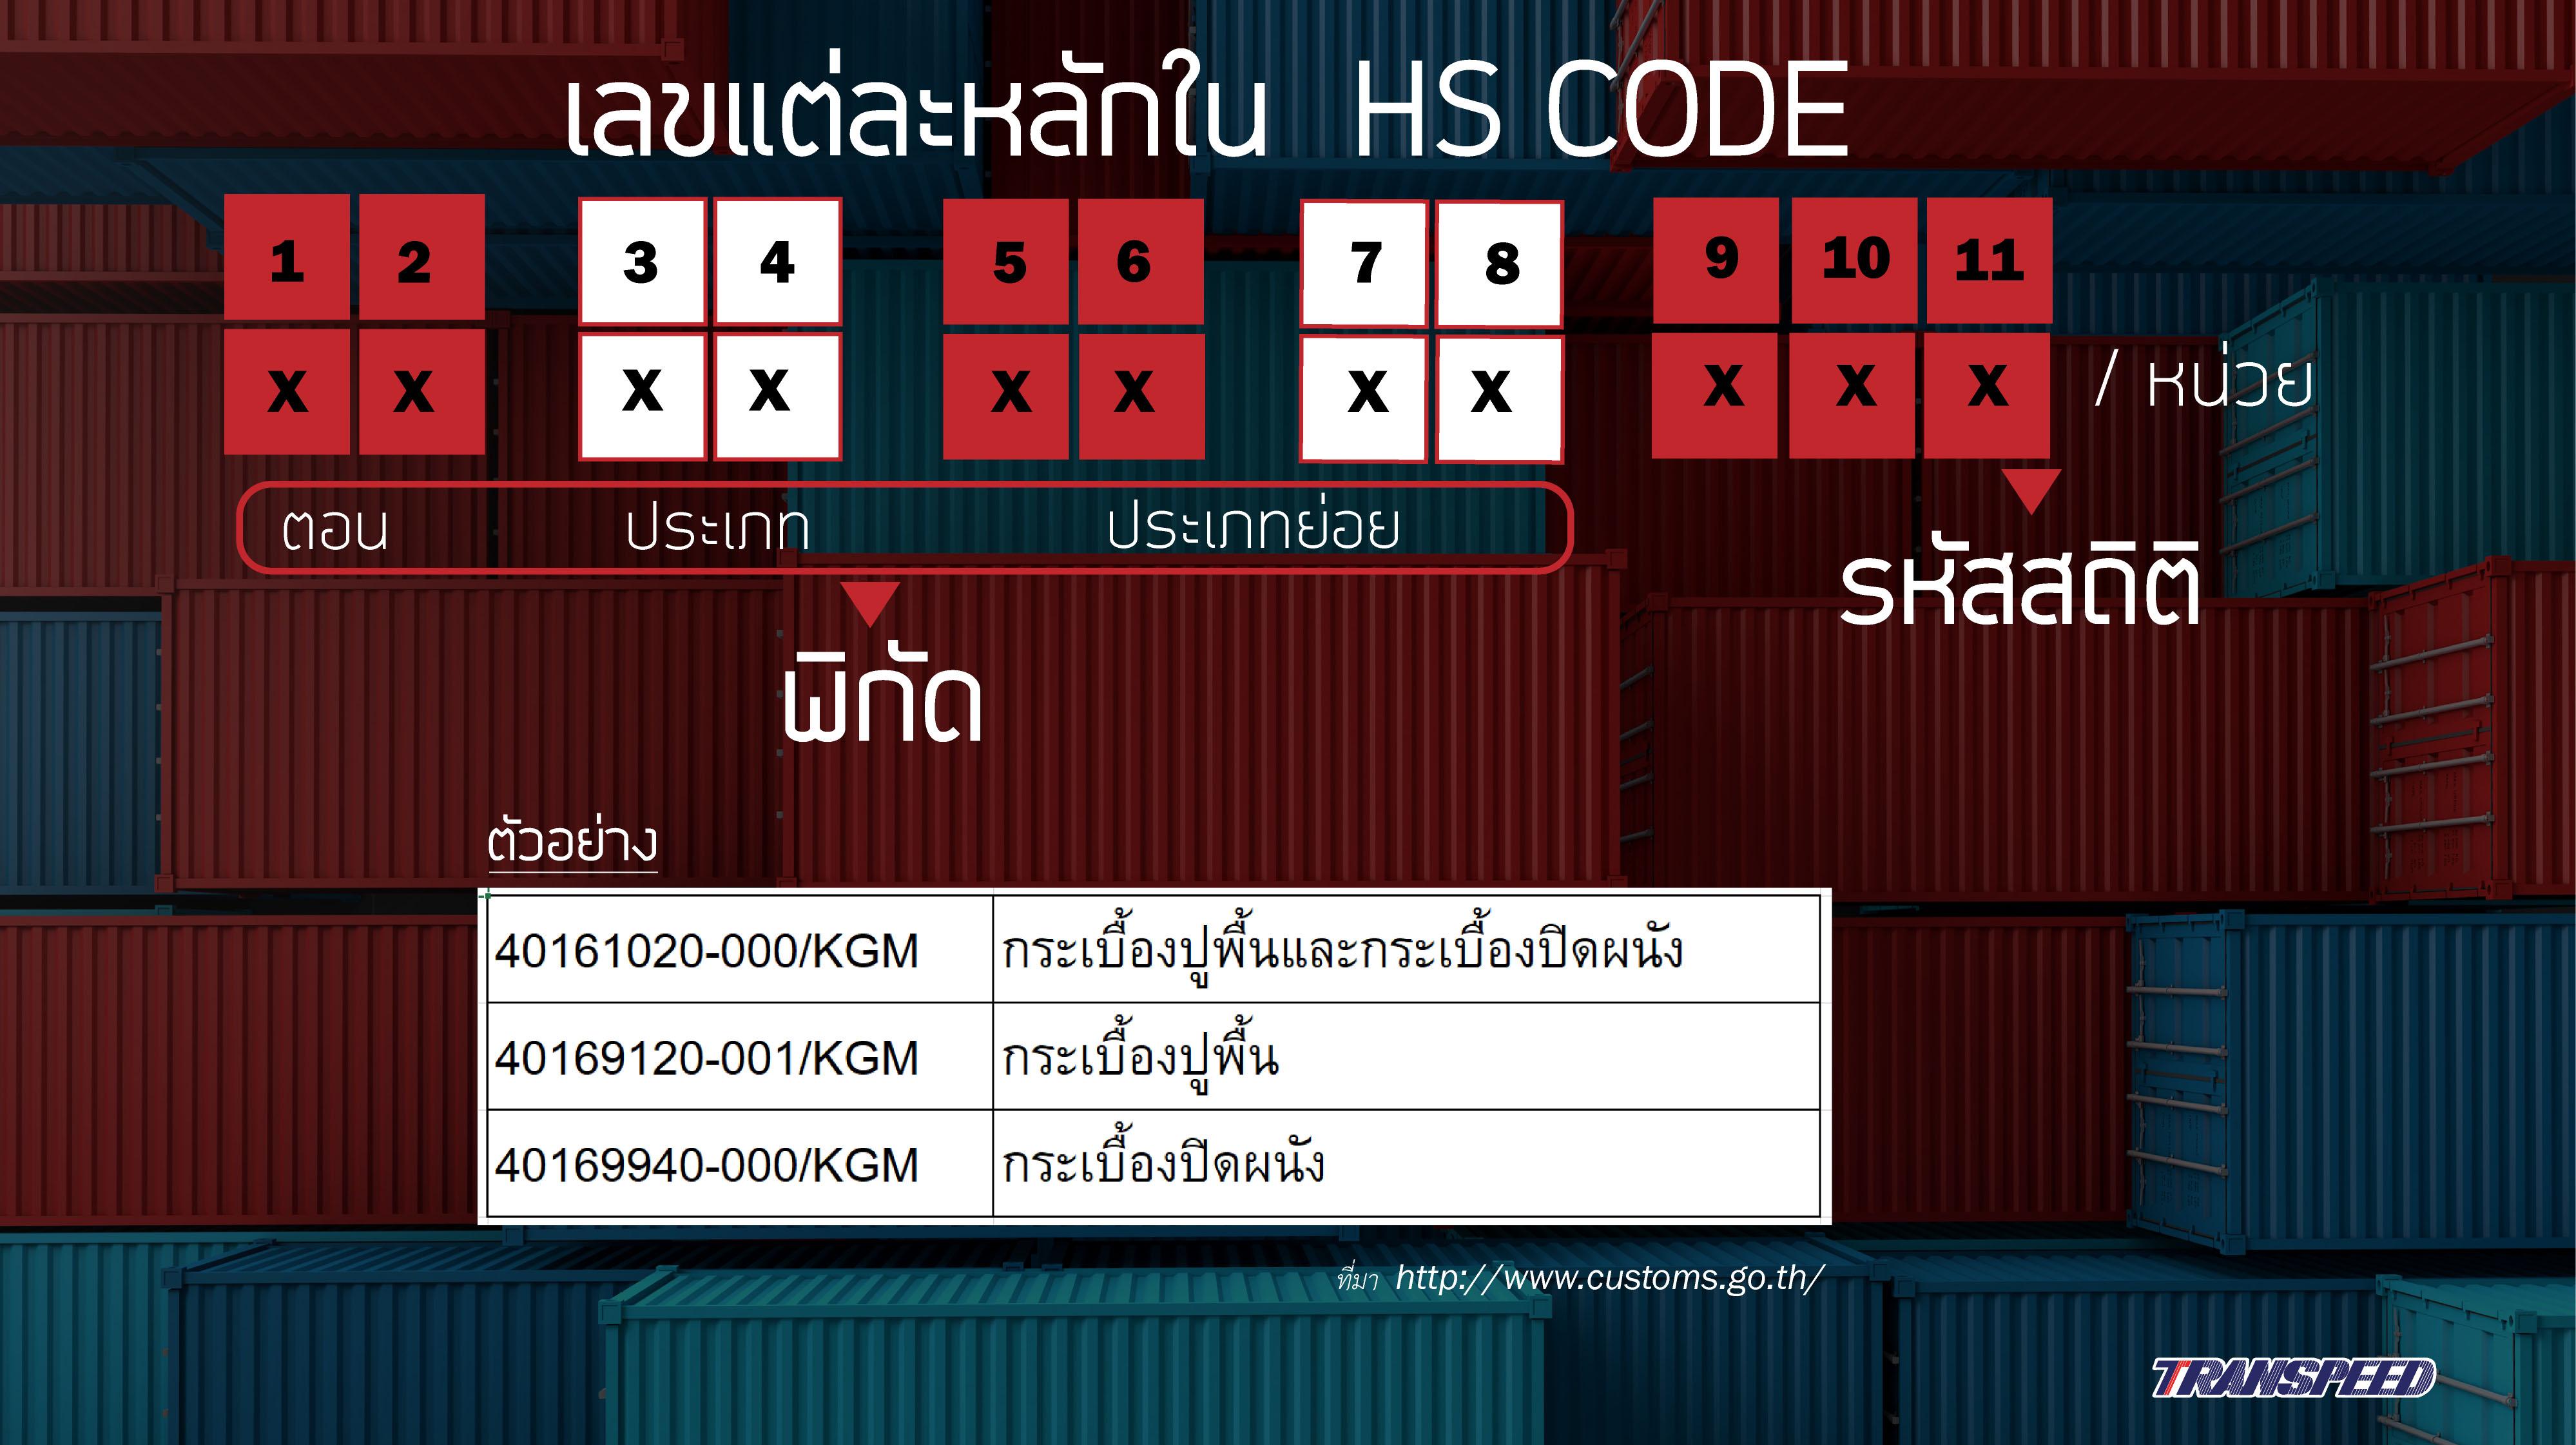 hs-code2-พิกัดสินค้า